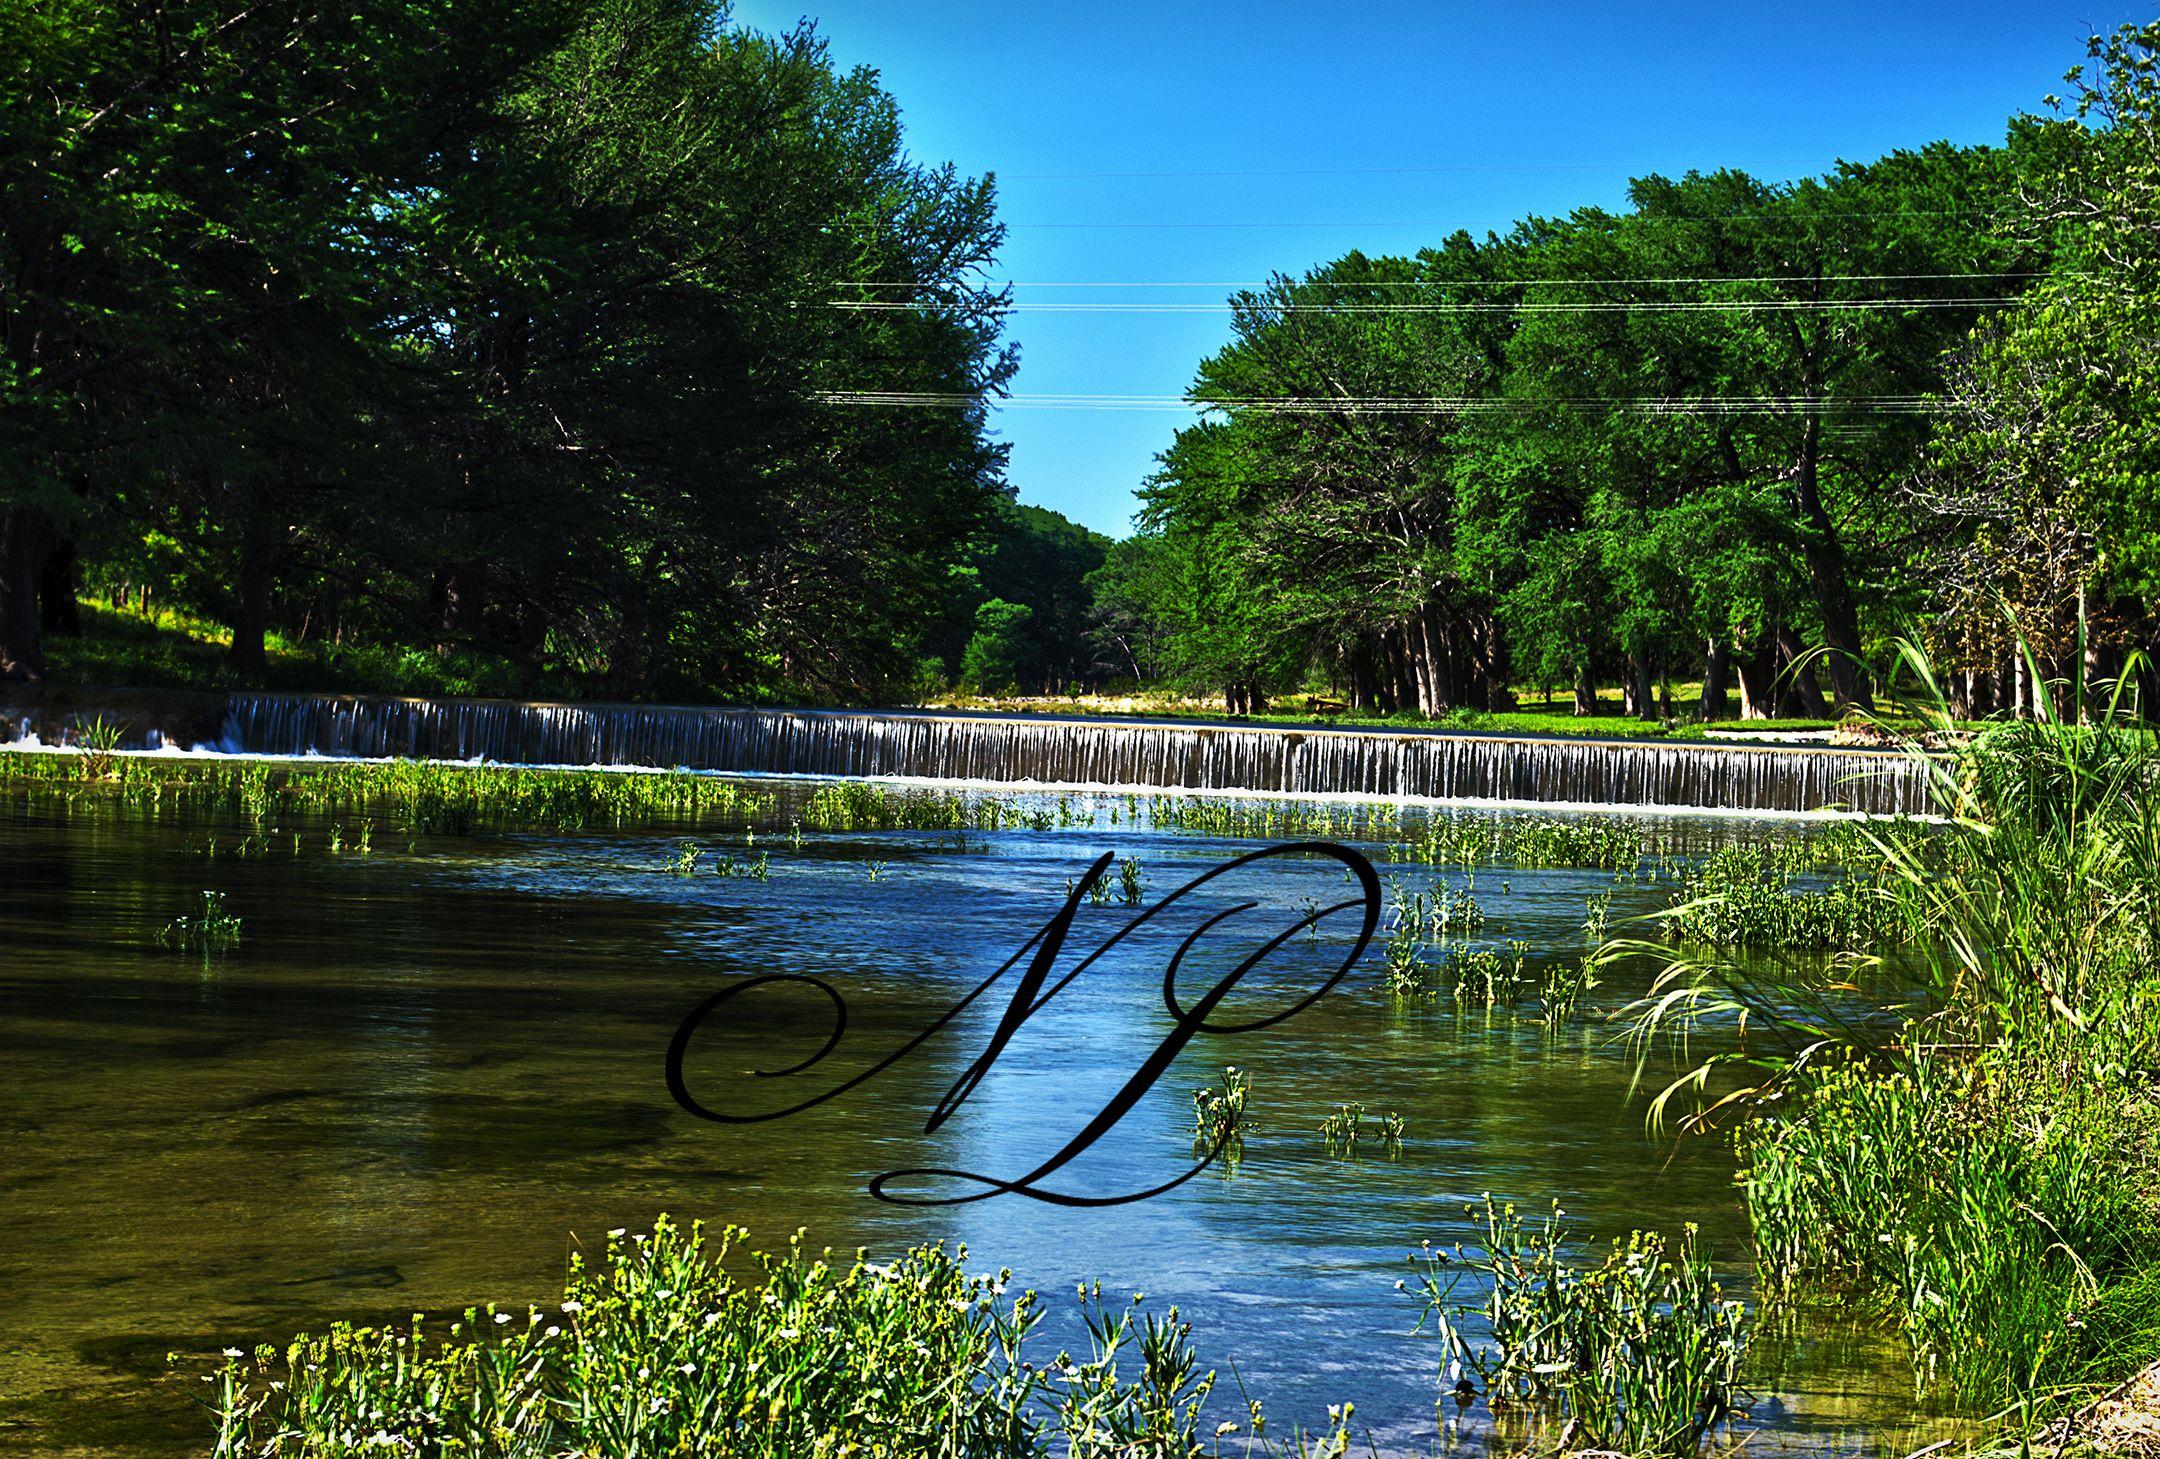 Sabinal River www.facebook.com/newlayer